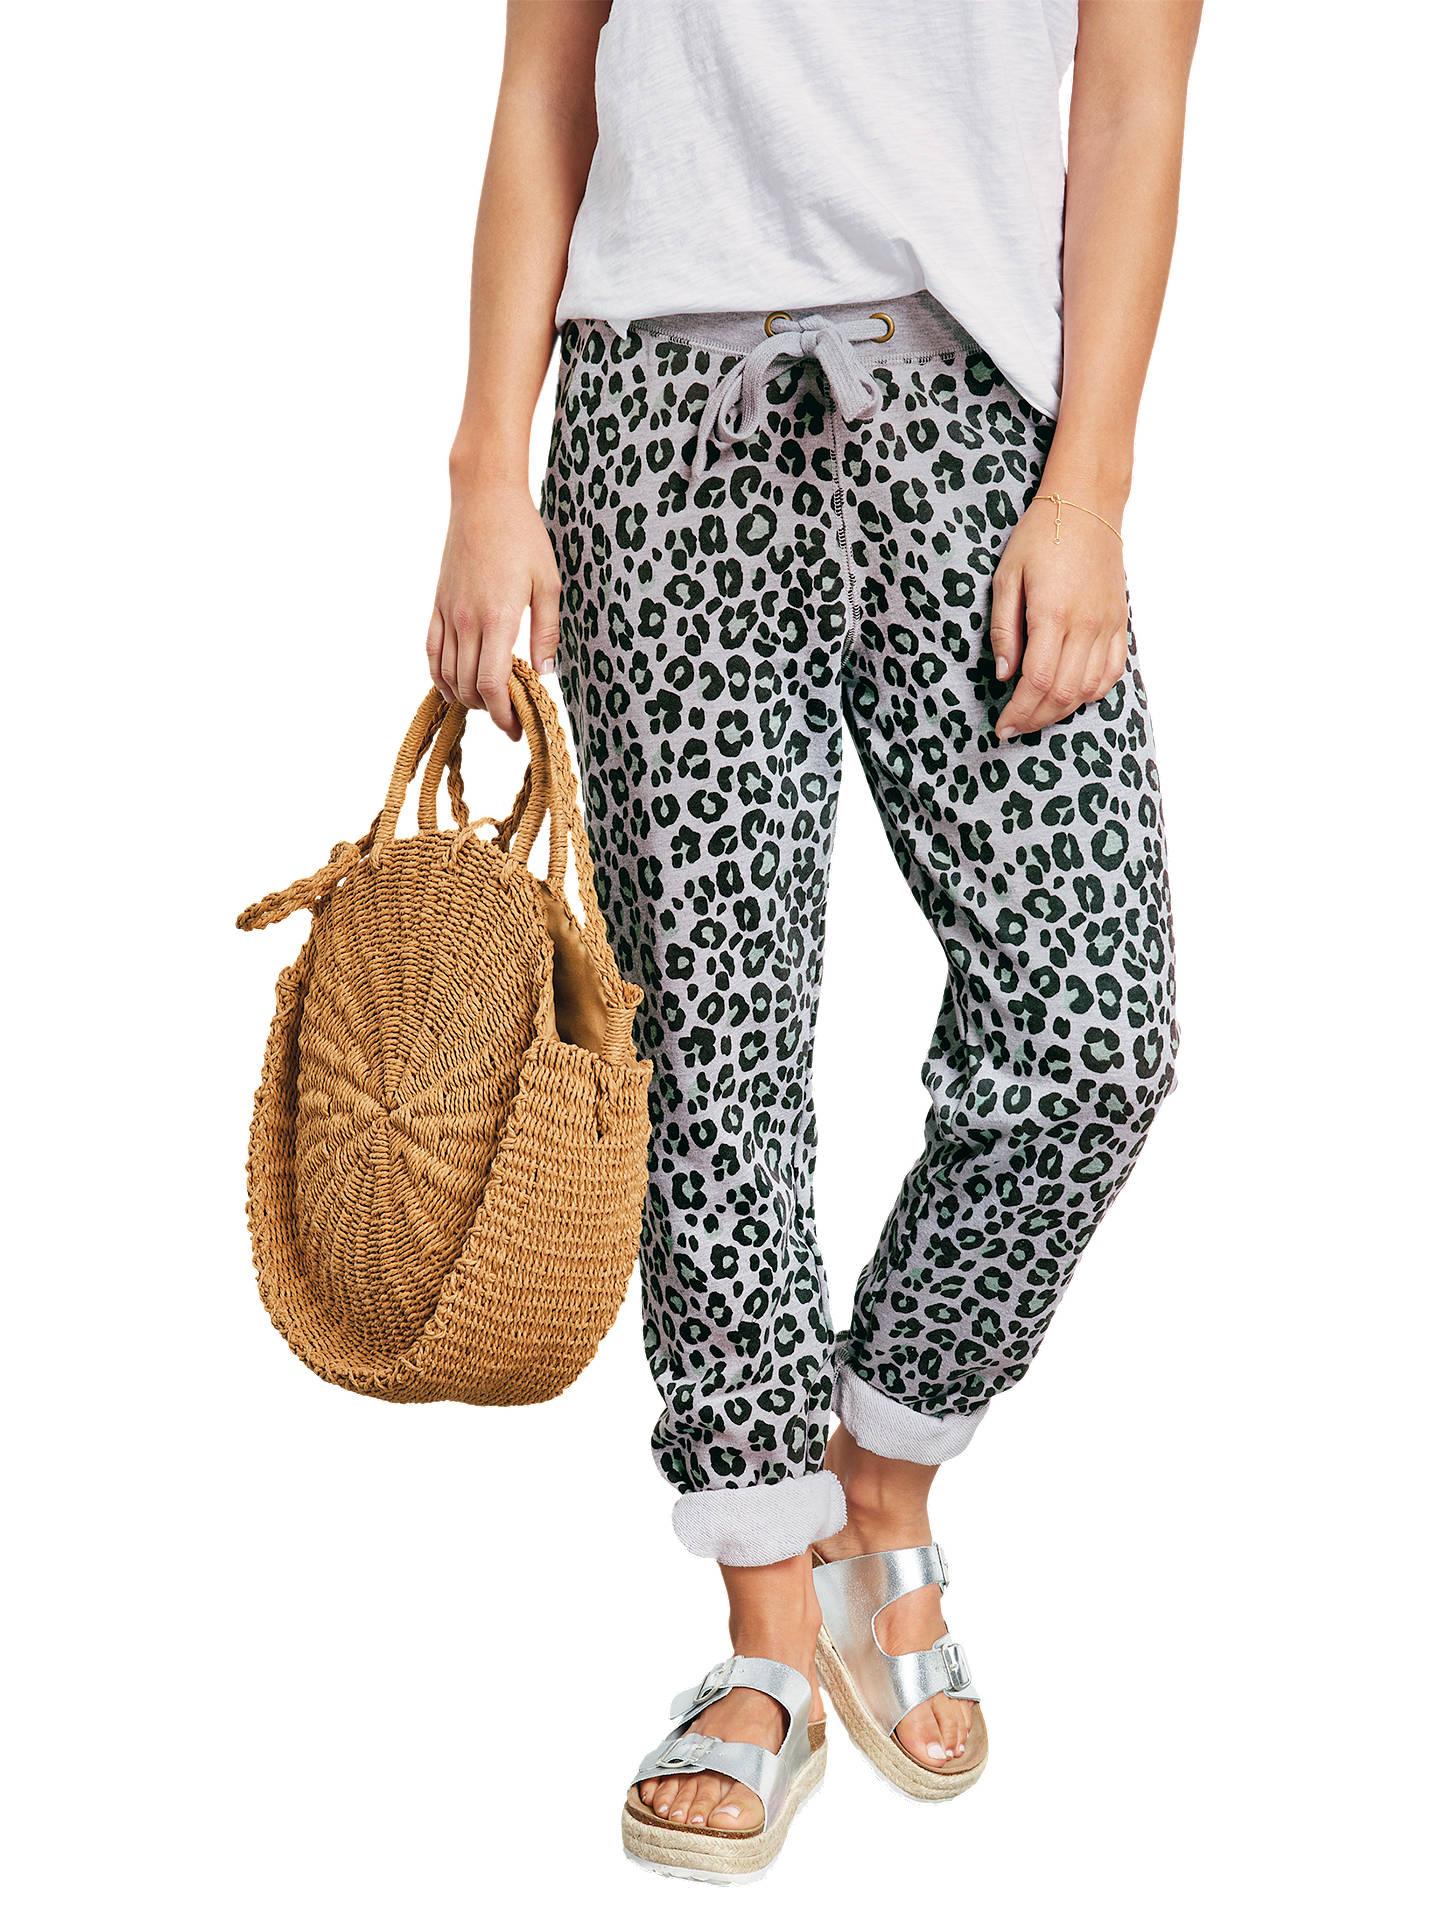 5881f4a4b7cd ... Buy hush Leopard Print Joggers, Green Leopard, XS Online at  johnlewis.com